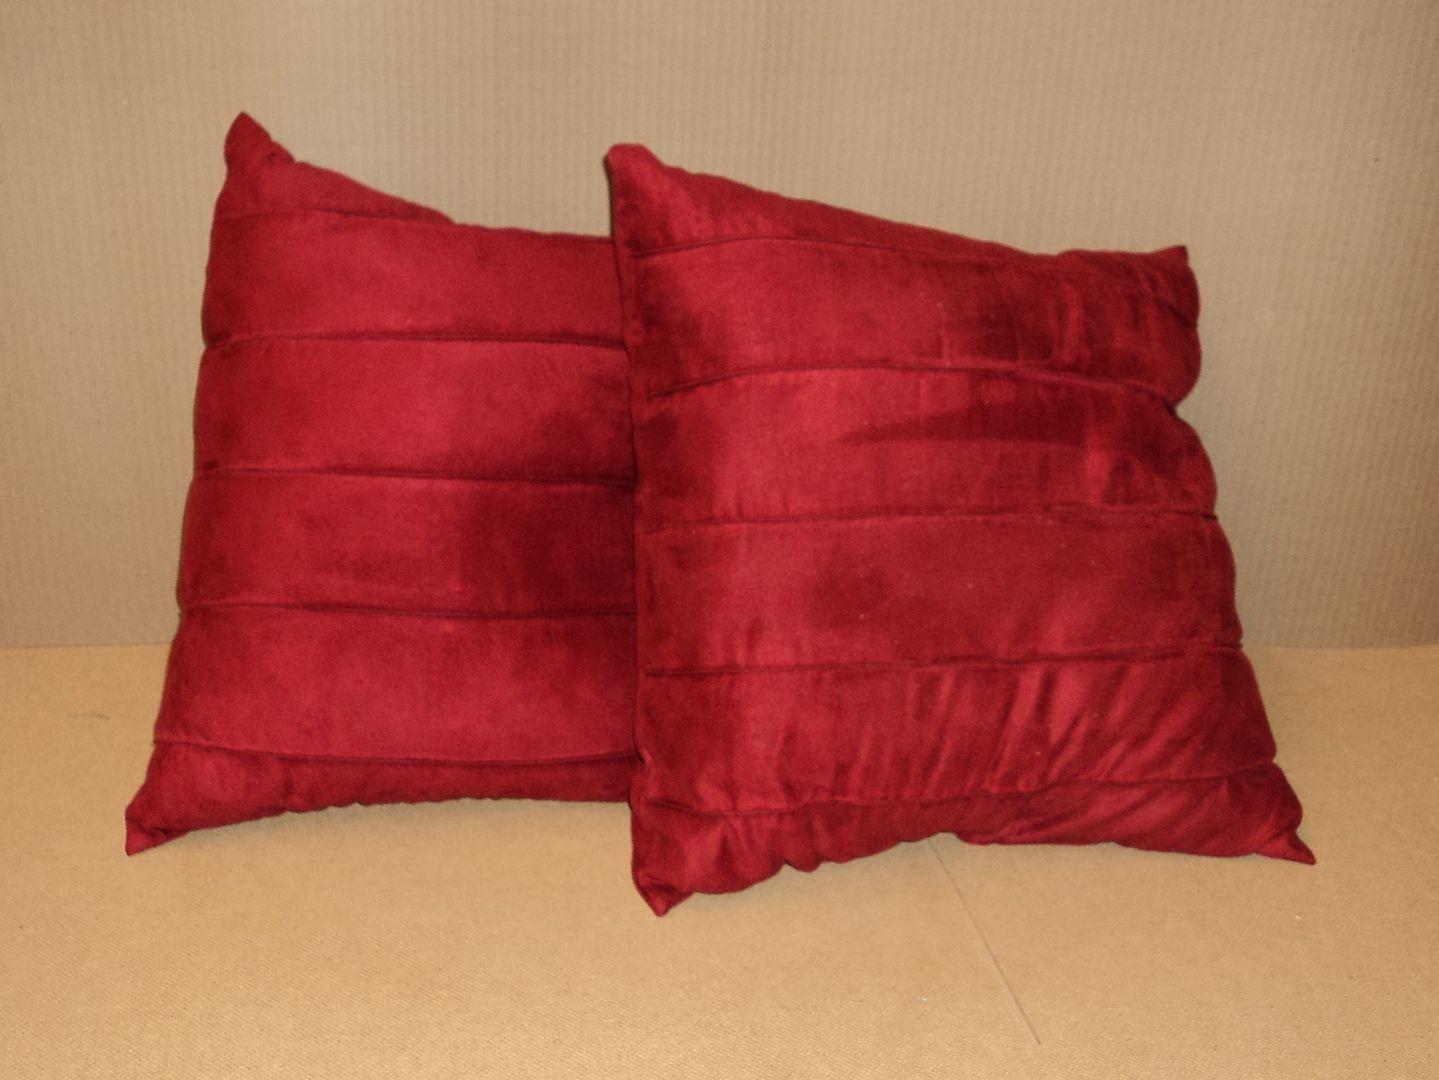 lm7410 111712-102n Designer Pillows 17in L x 17in W x 7in D Red Solid Set of 2 Ultrasuede